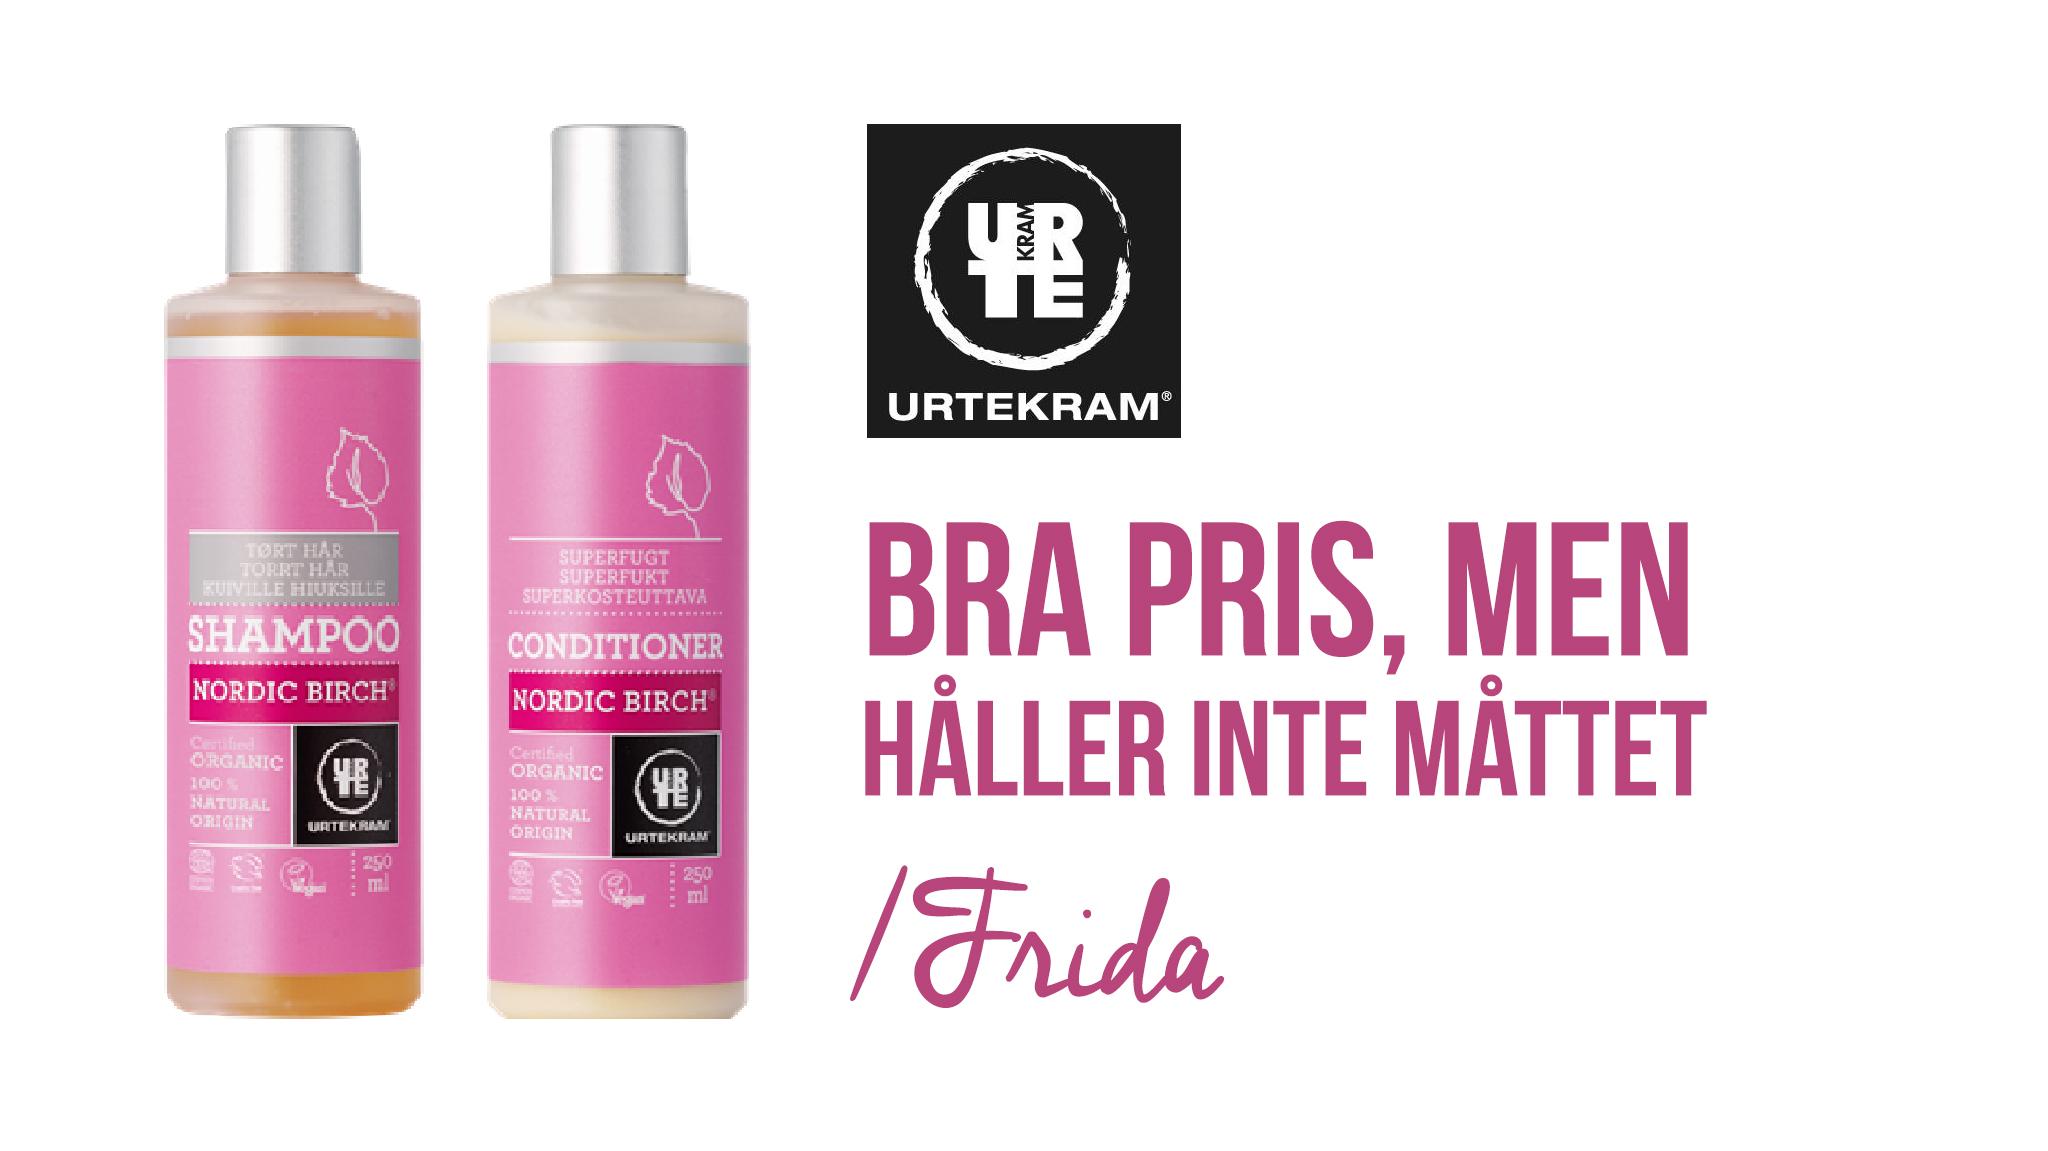 Nordic Birch Urtekram